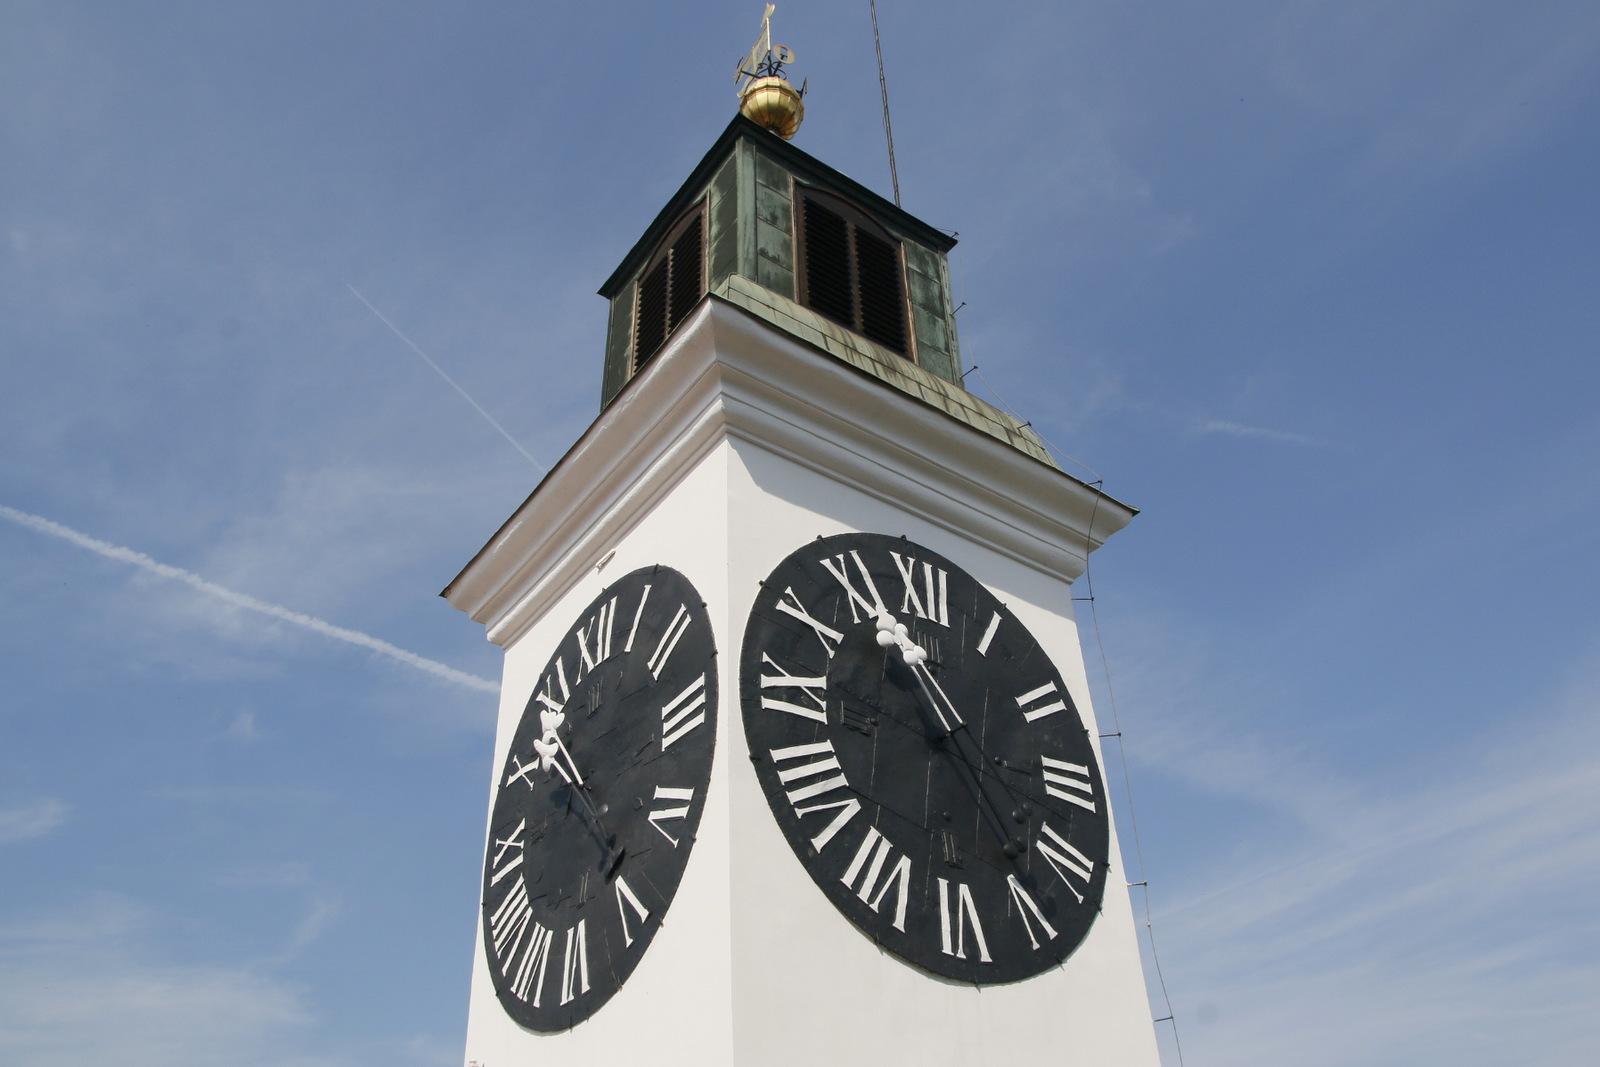 Petrovaradinski urni stolp